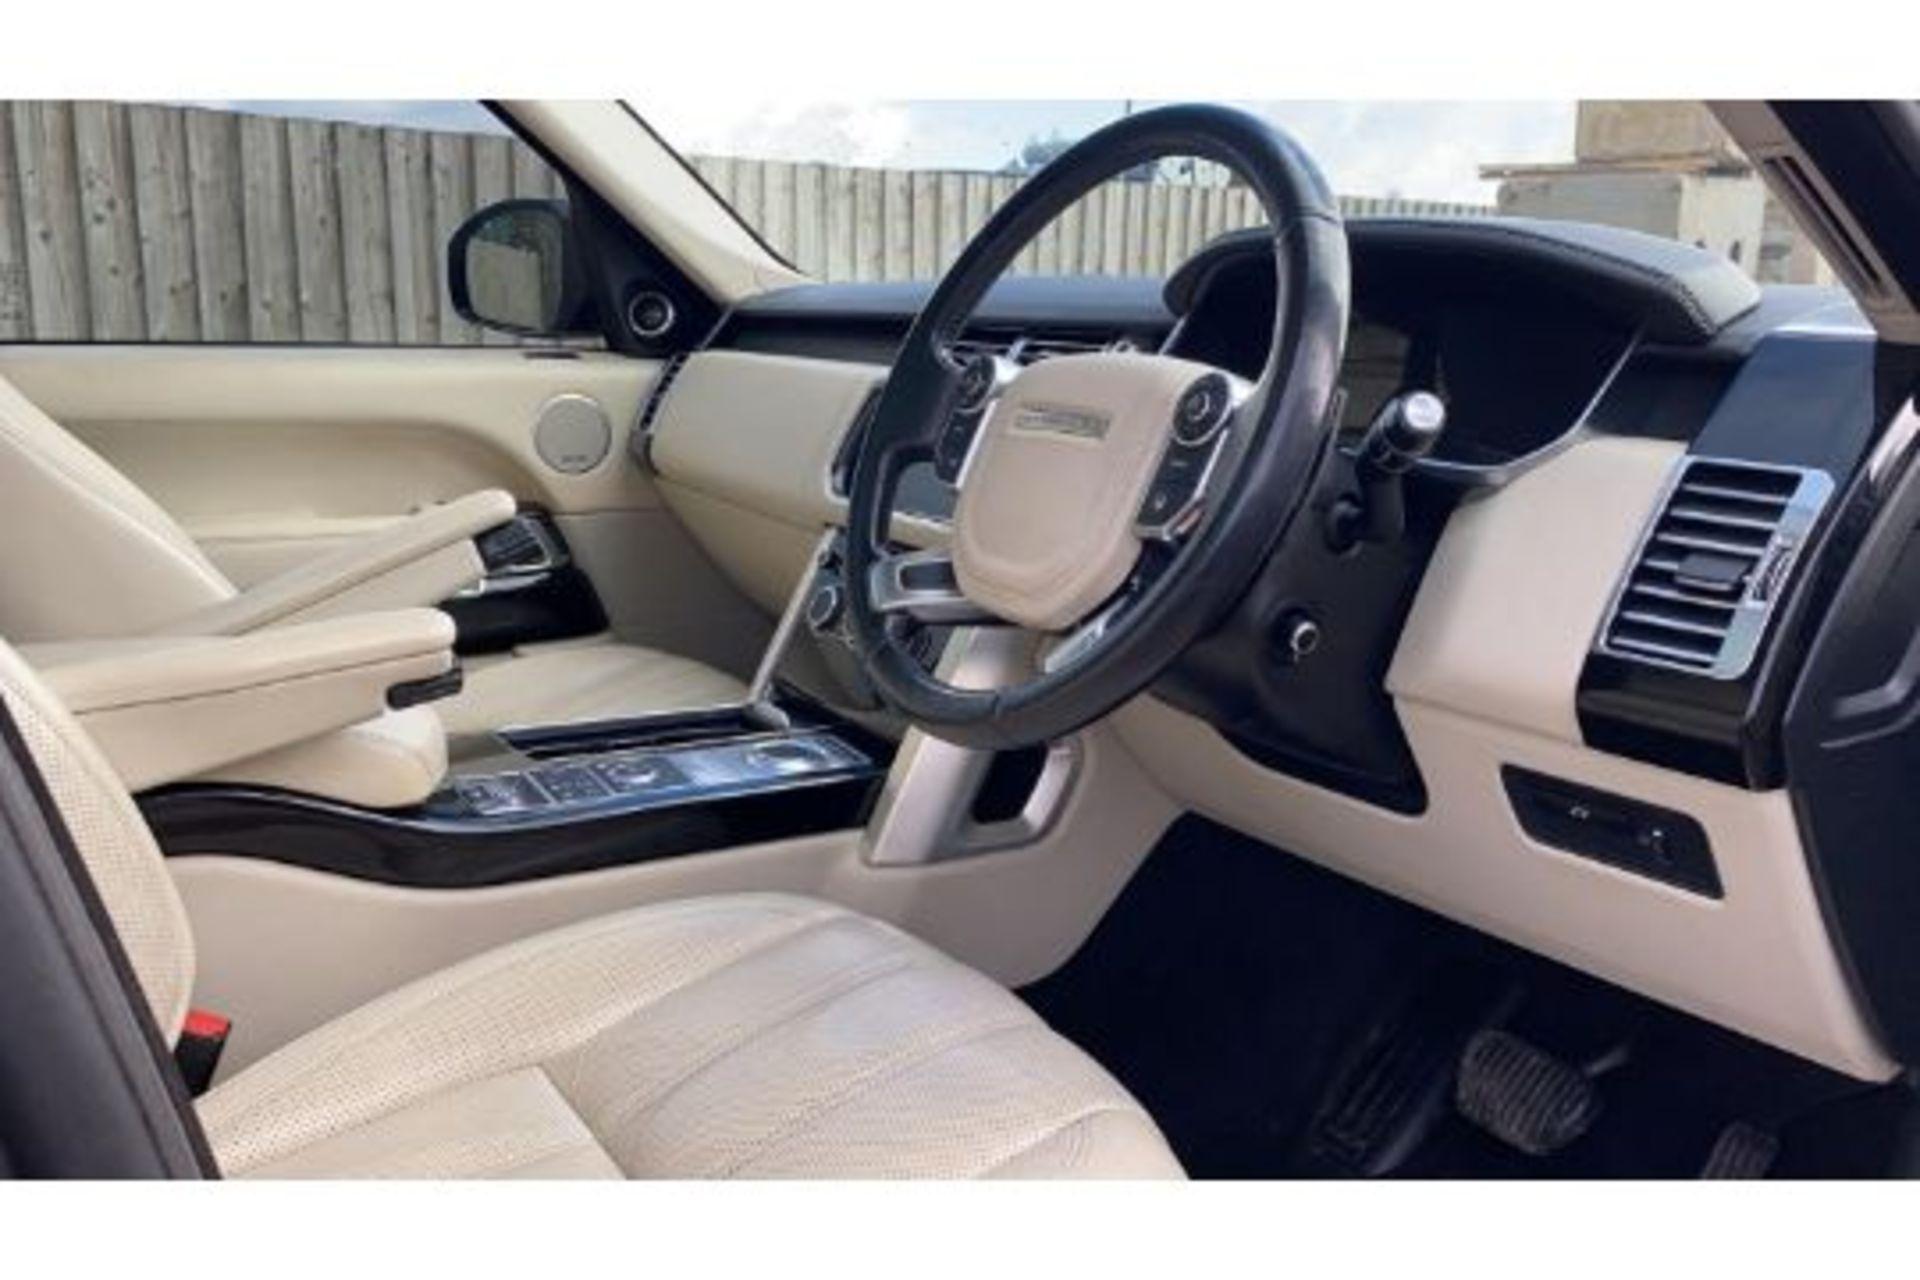 Range Rover Vogue 3.0 TDV6 SE Auto - Black Pack - NEW SHAPE - FULLY LOADED - Pan Roof - Image 12 of 30